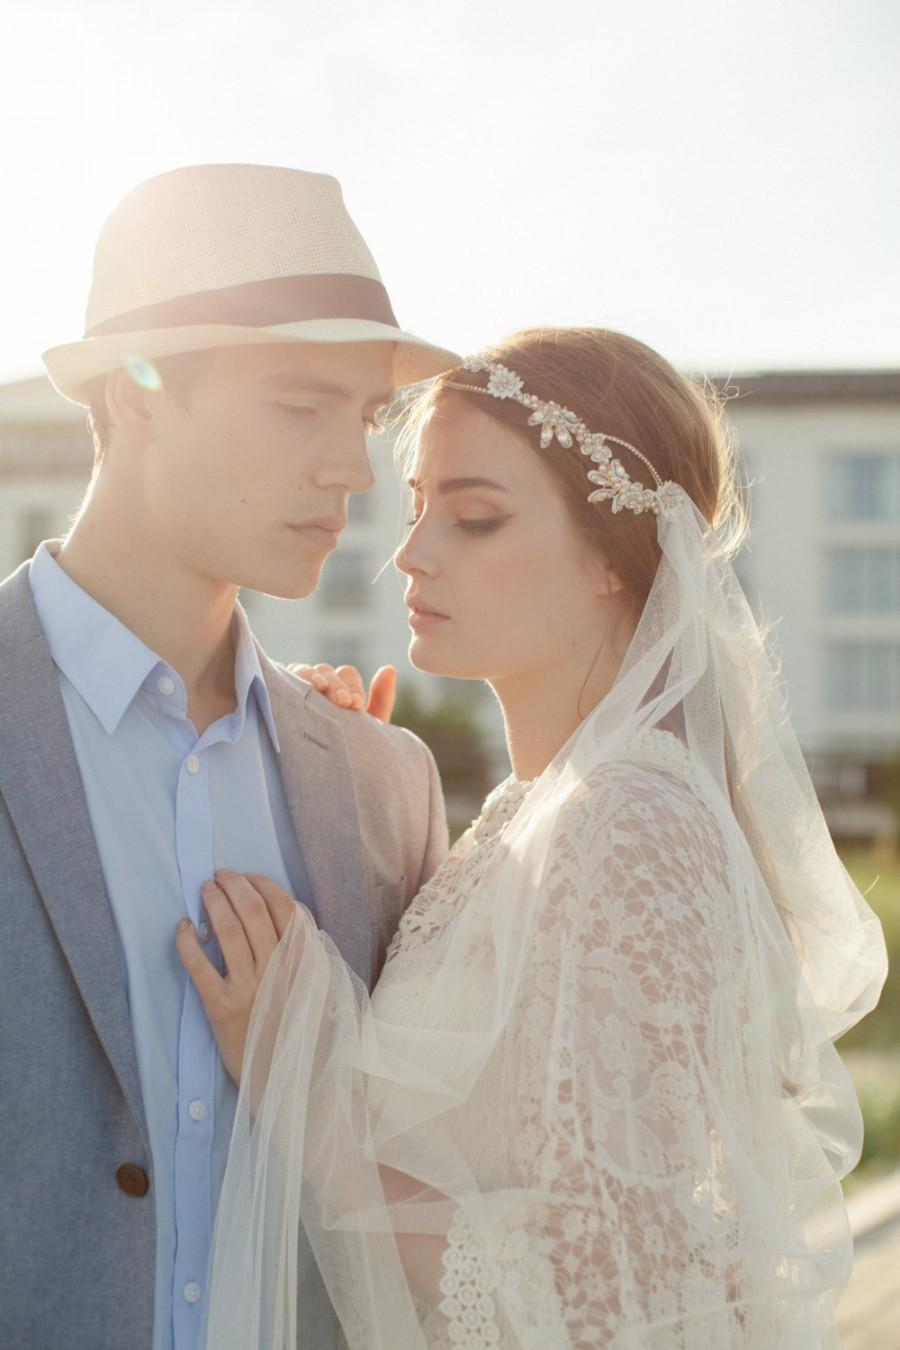 Hochzeit - Silk Tulle Veil - Bridal Veil - Ivory Wedding Veil - Mantilla Veil - Floor Length Veil - Lace Edged Bridal Veil - MABEL